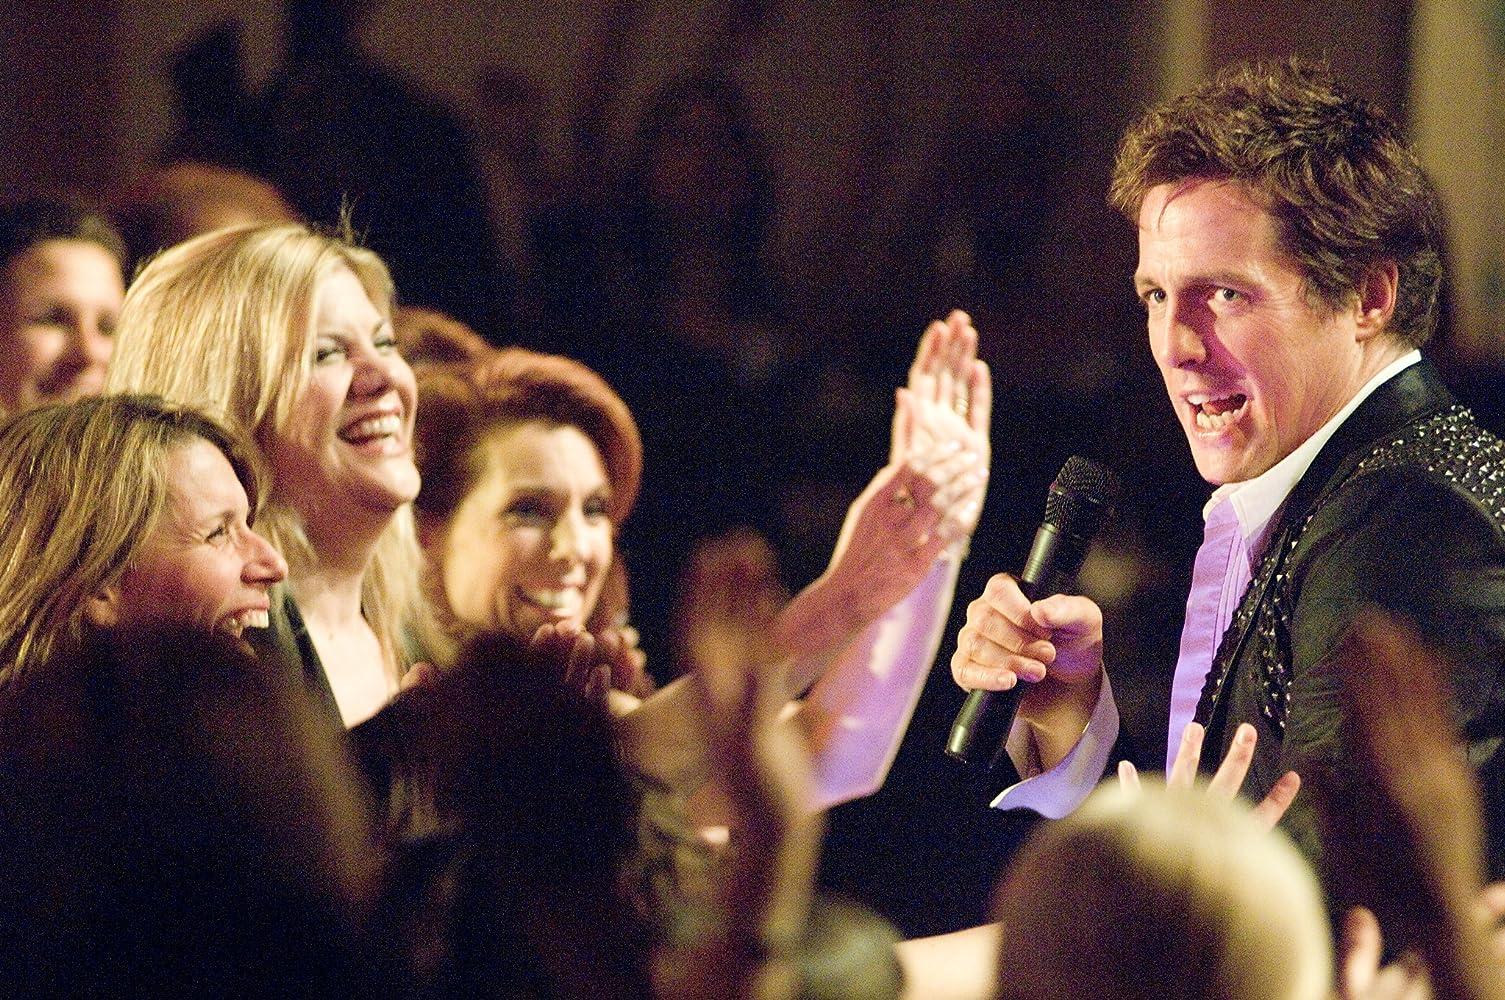 Hugh Grant and Kristen Johnston in Music and Lyrics (2007)